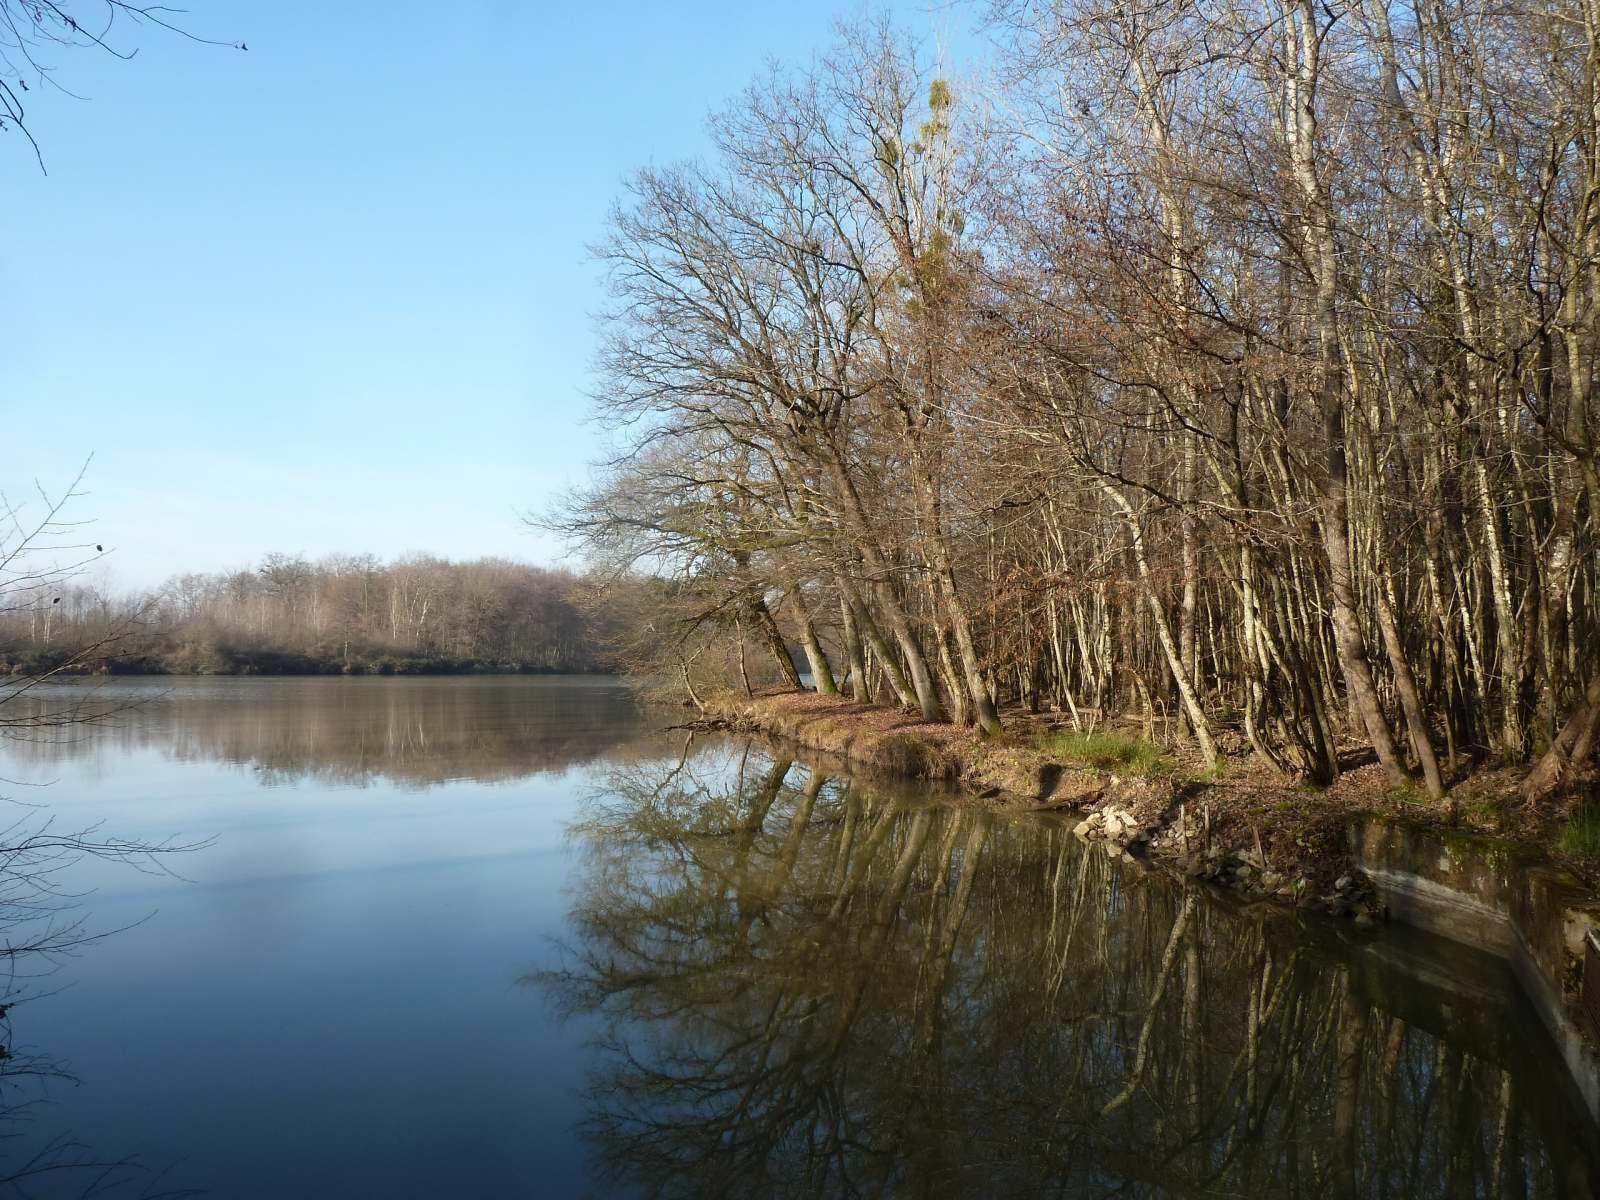 Gerland : sa forêt et ses étangs (17/12/2015)